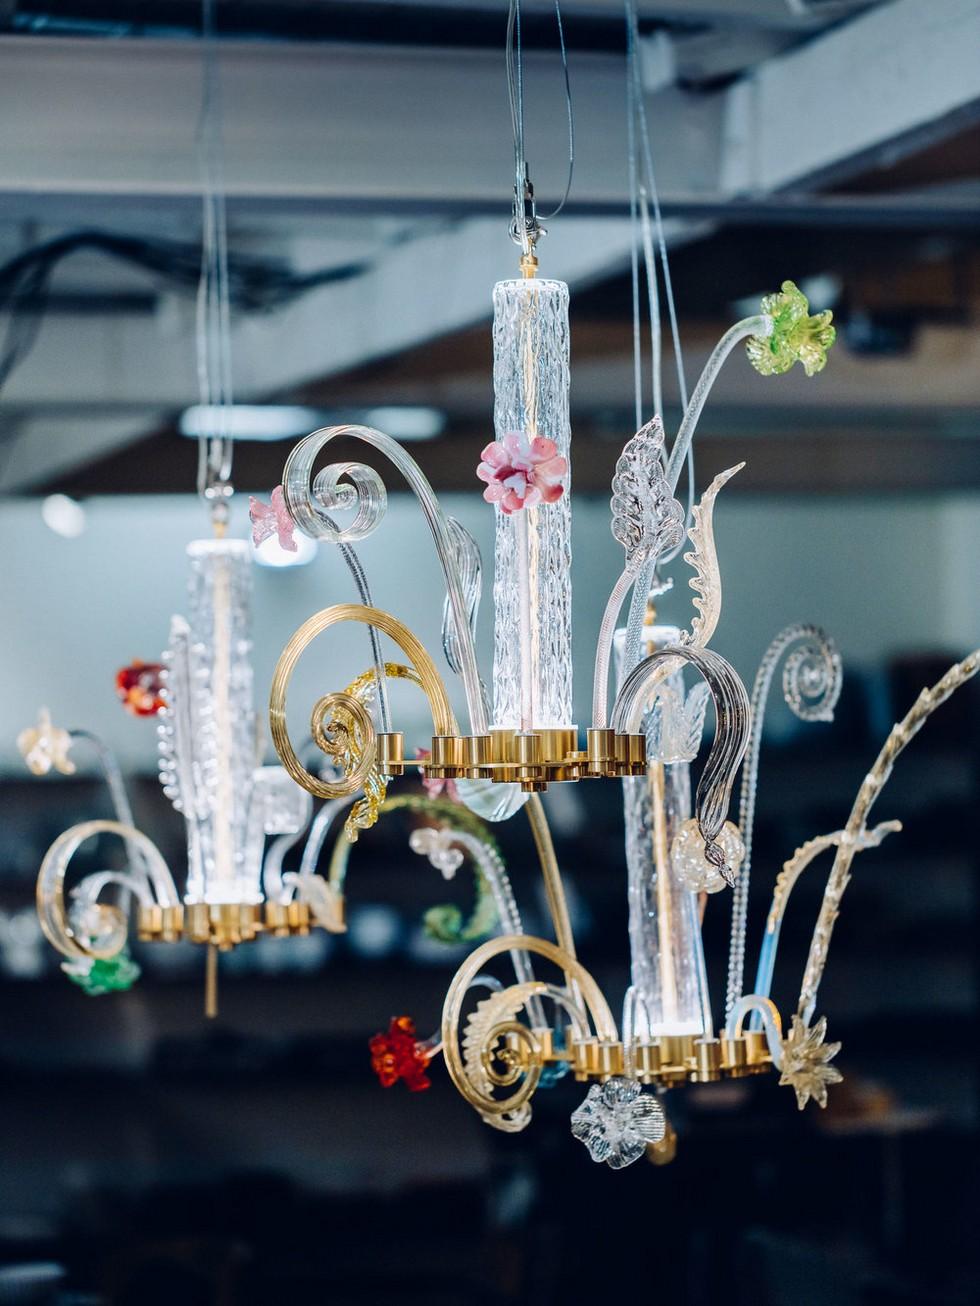 Veronese chandeliers salone del mobile 2017 Salone del Mobile 2017 – Piet Hein Eek remakes Veronese chandeliers Veronese